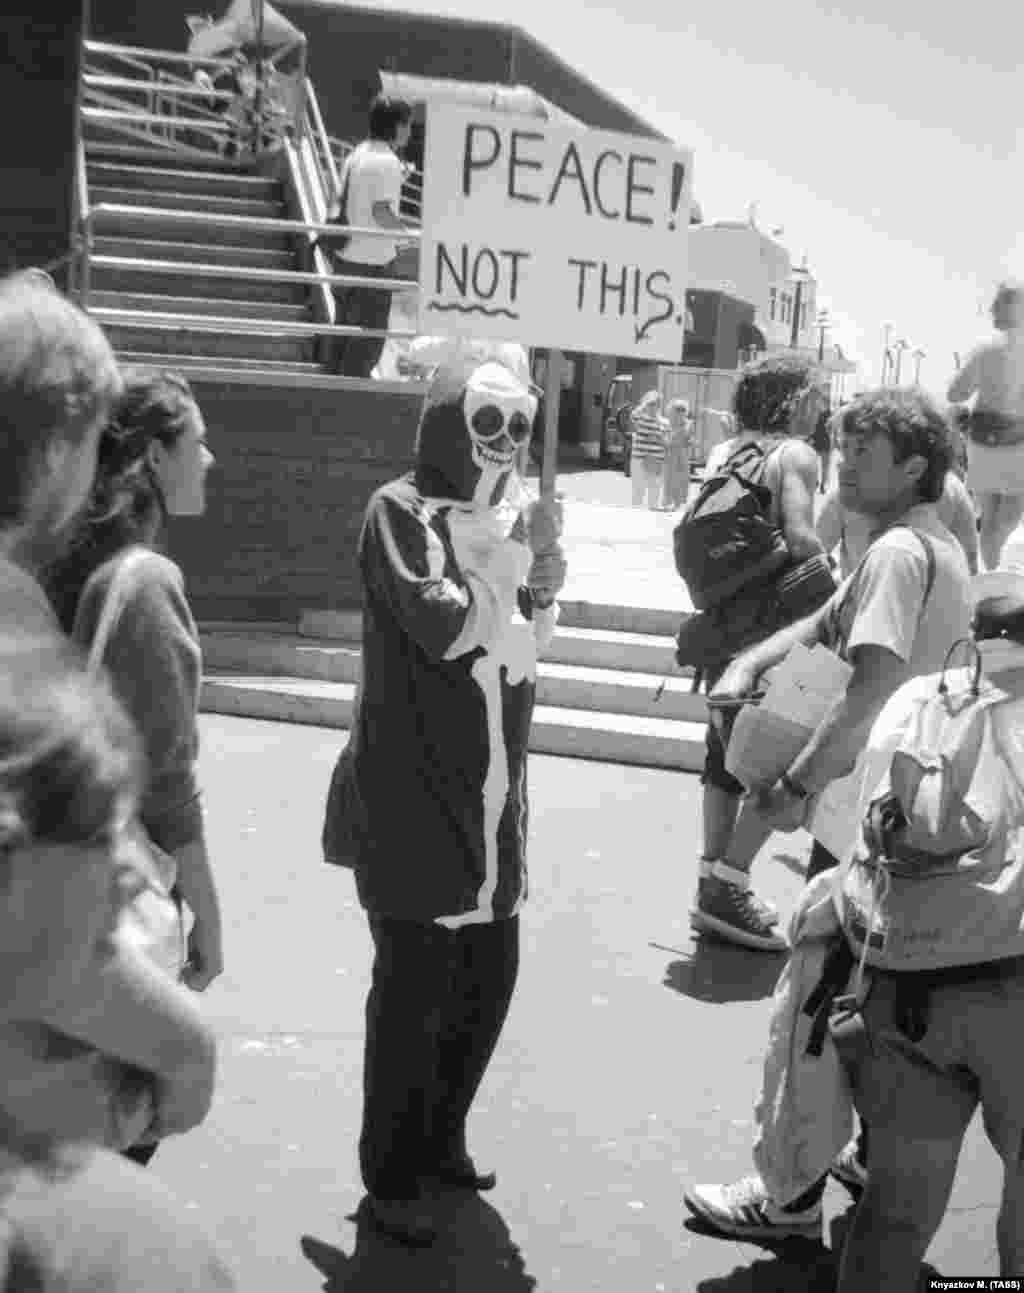 An antiwar protester in Santa Cruz, California, in 1988.